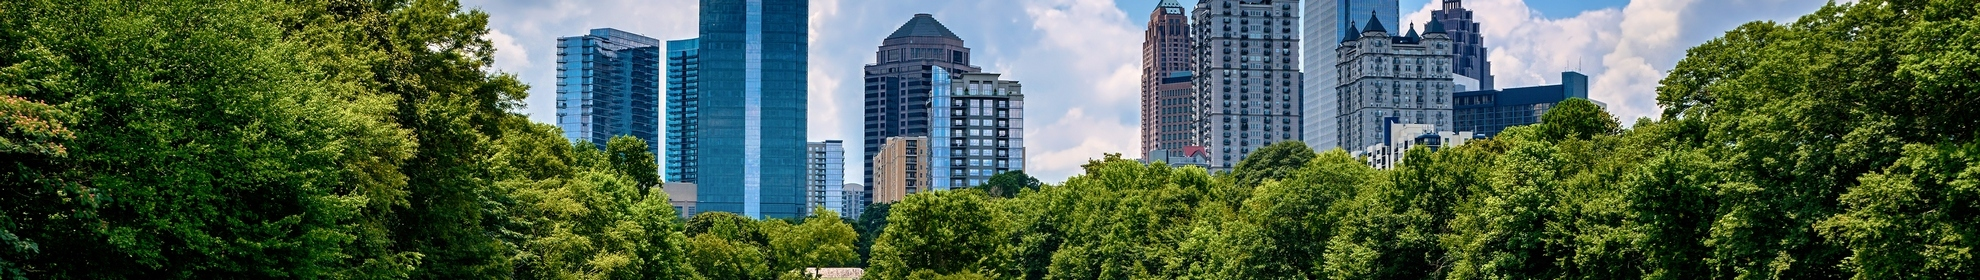 Hilton Garden Inn Atlanta Downtown Atlanta | Great Prices, Book and Save